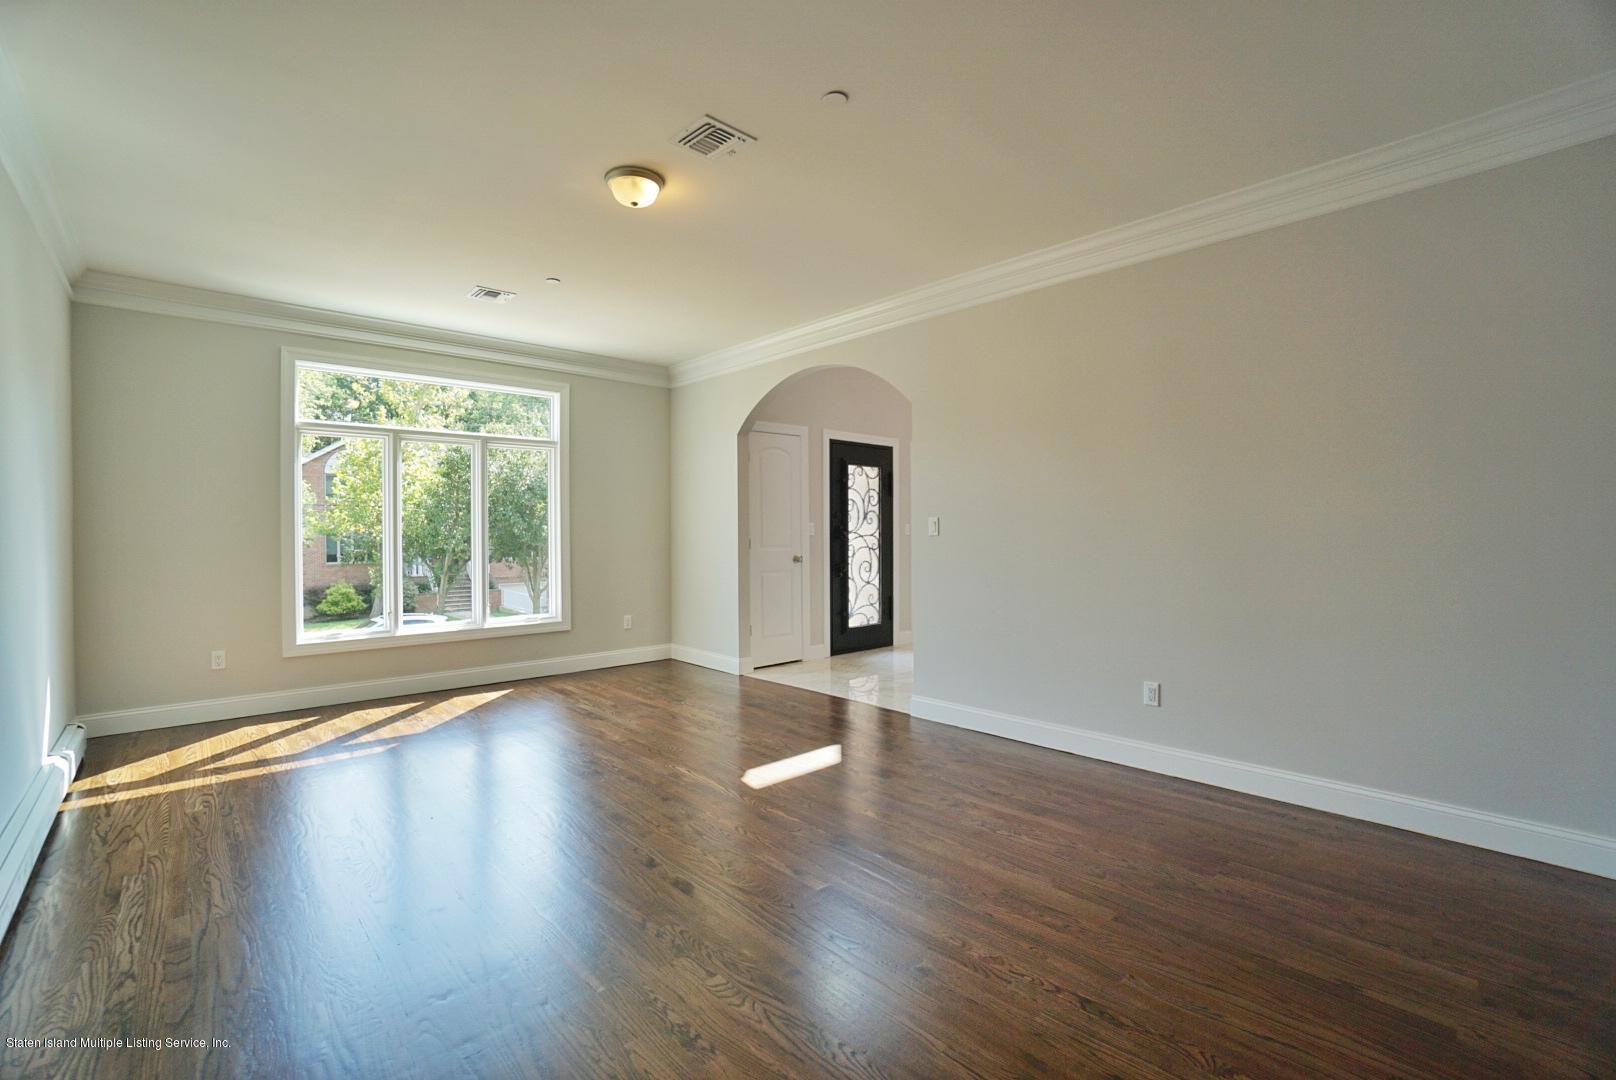 488 Richard Avenue,Staten Island,New York,10309,United States,5 Bedrooms Bedrooms,8 Rooms Rooms,4 BathroomsBathrooms,Residential,Richard,1130577